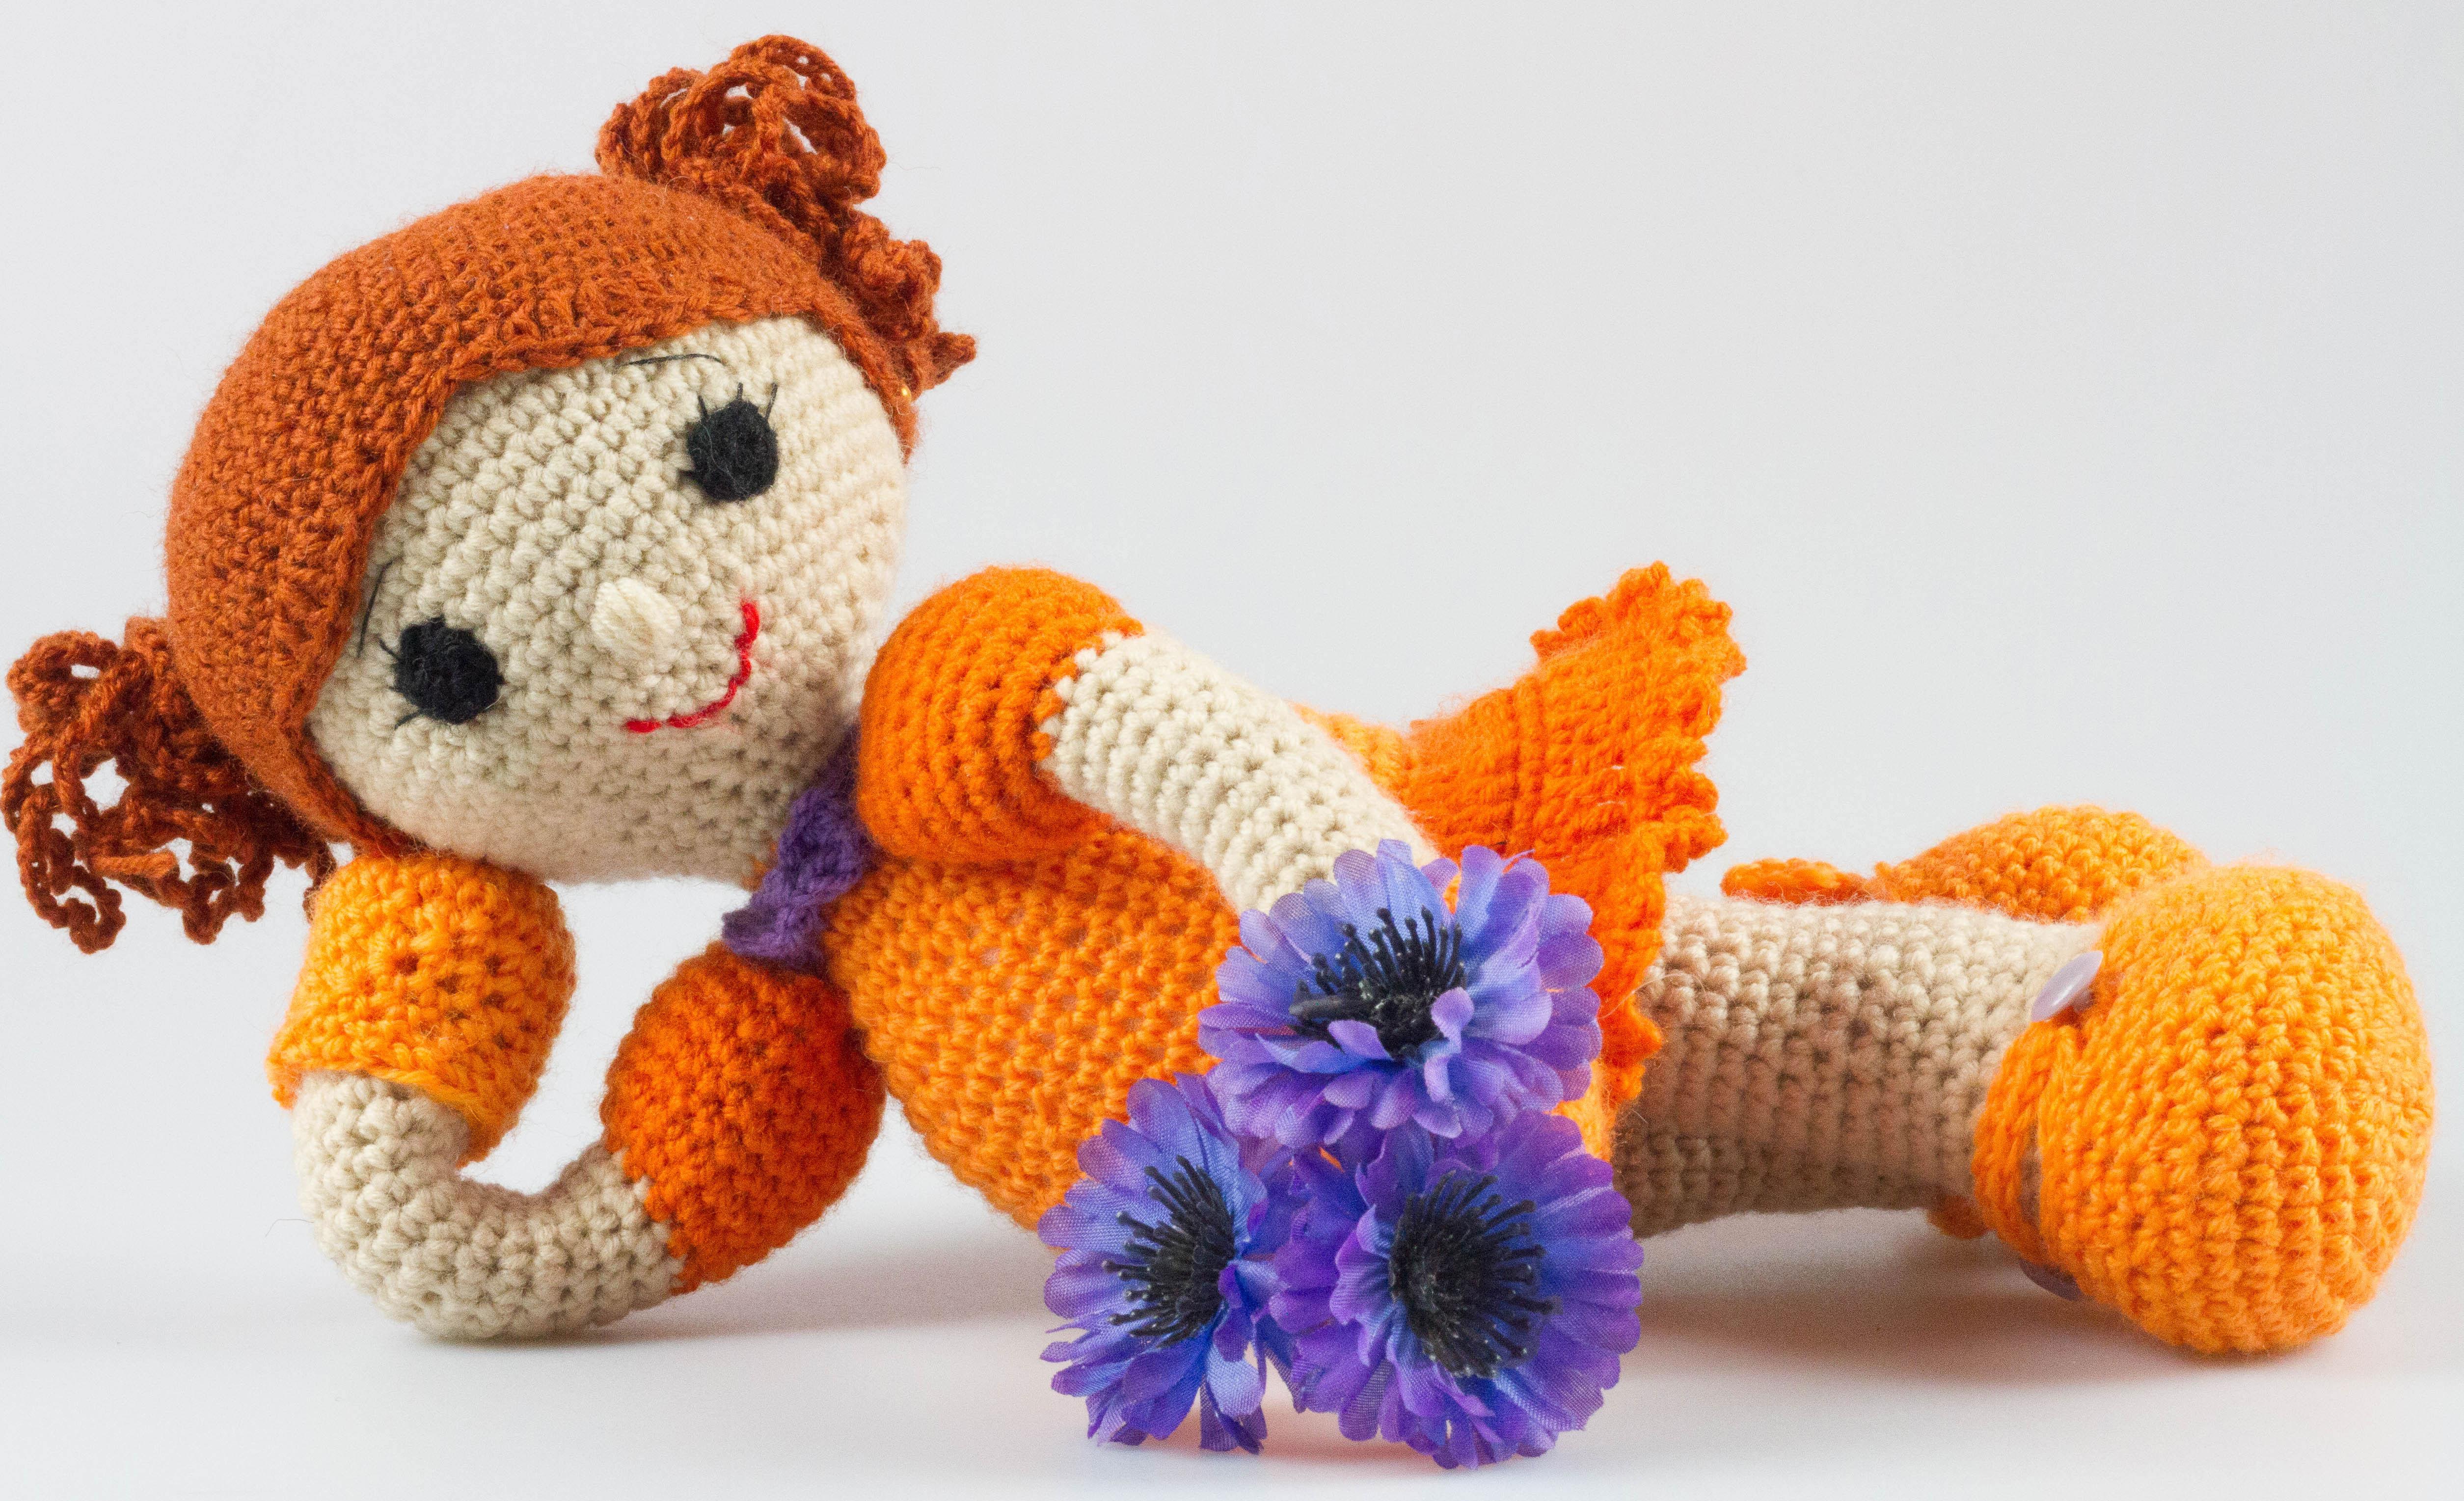 56+ Cute and Amazing Amigurumi Doll Crochet Pattern Ideas - Page ... | 3058x5019